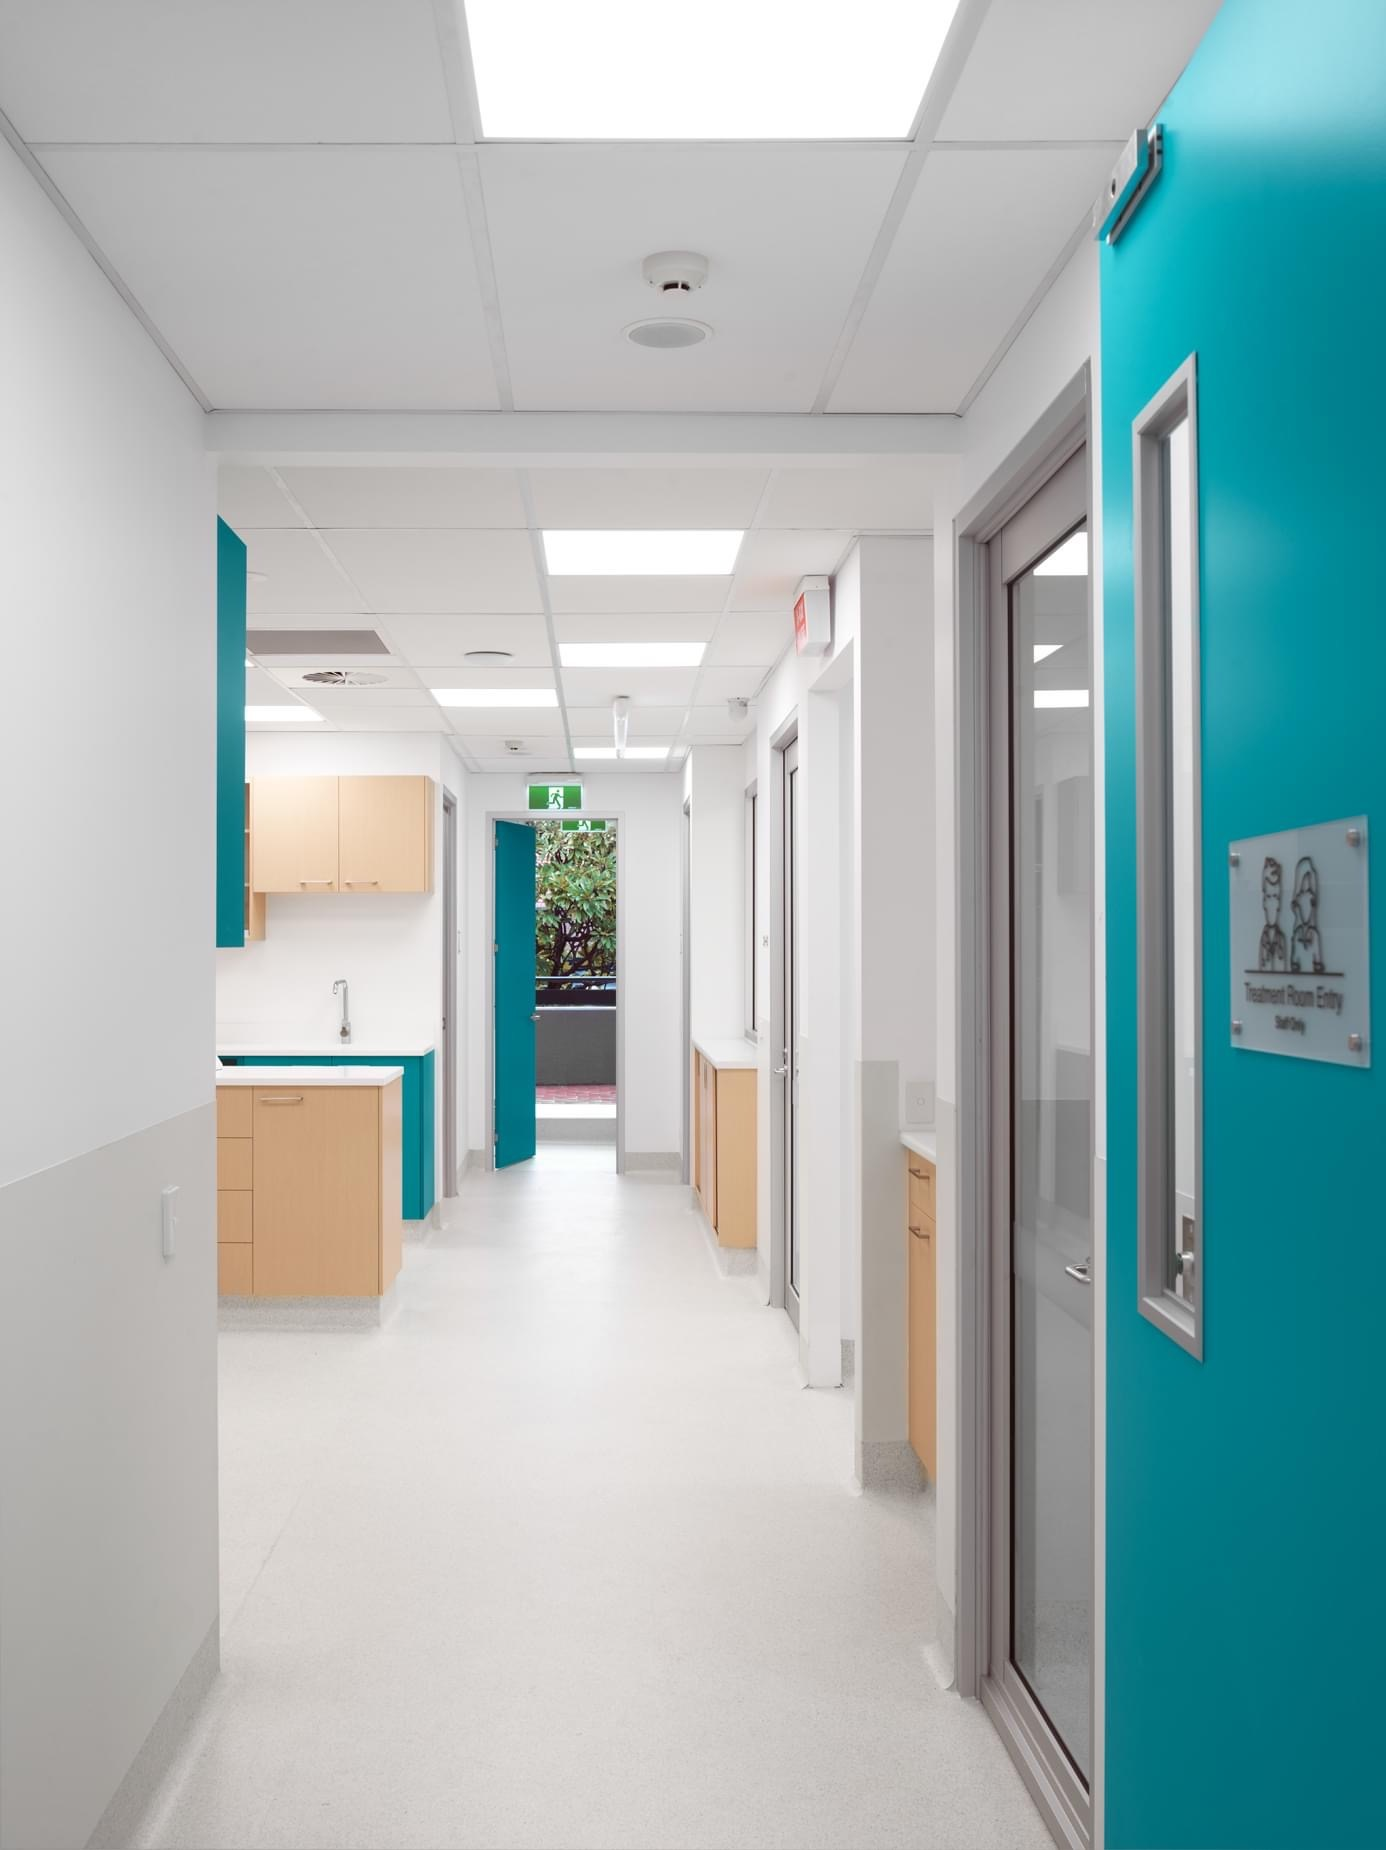 Crows Nest Animal Hospital Karas Design.